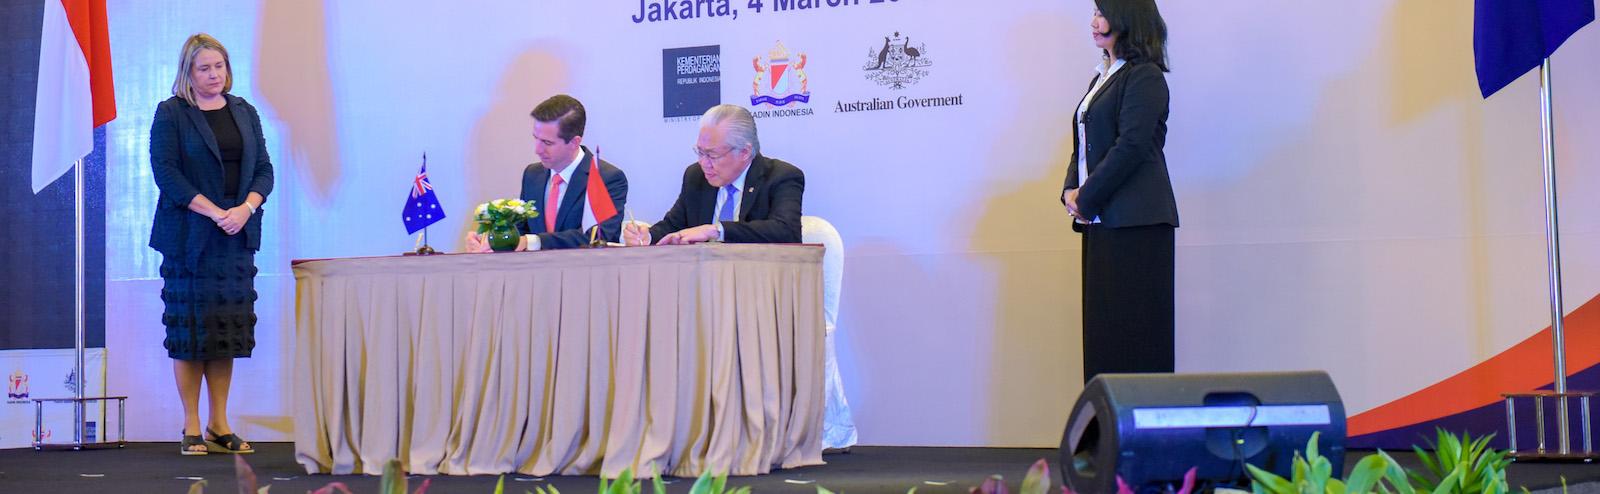 IA-CEPA signing ceremony (Australia Embassy Jakarta/ Flickr)